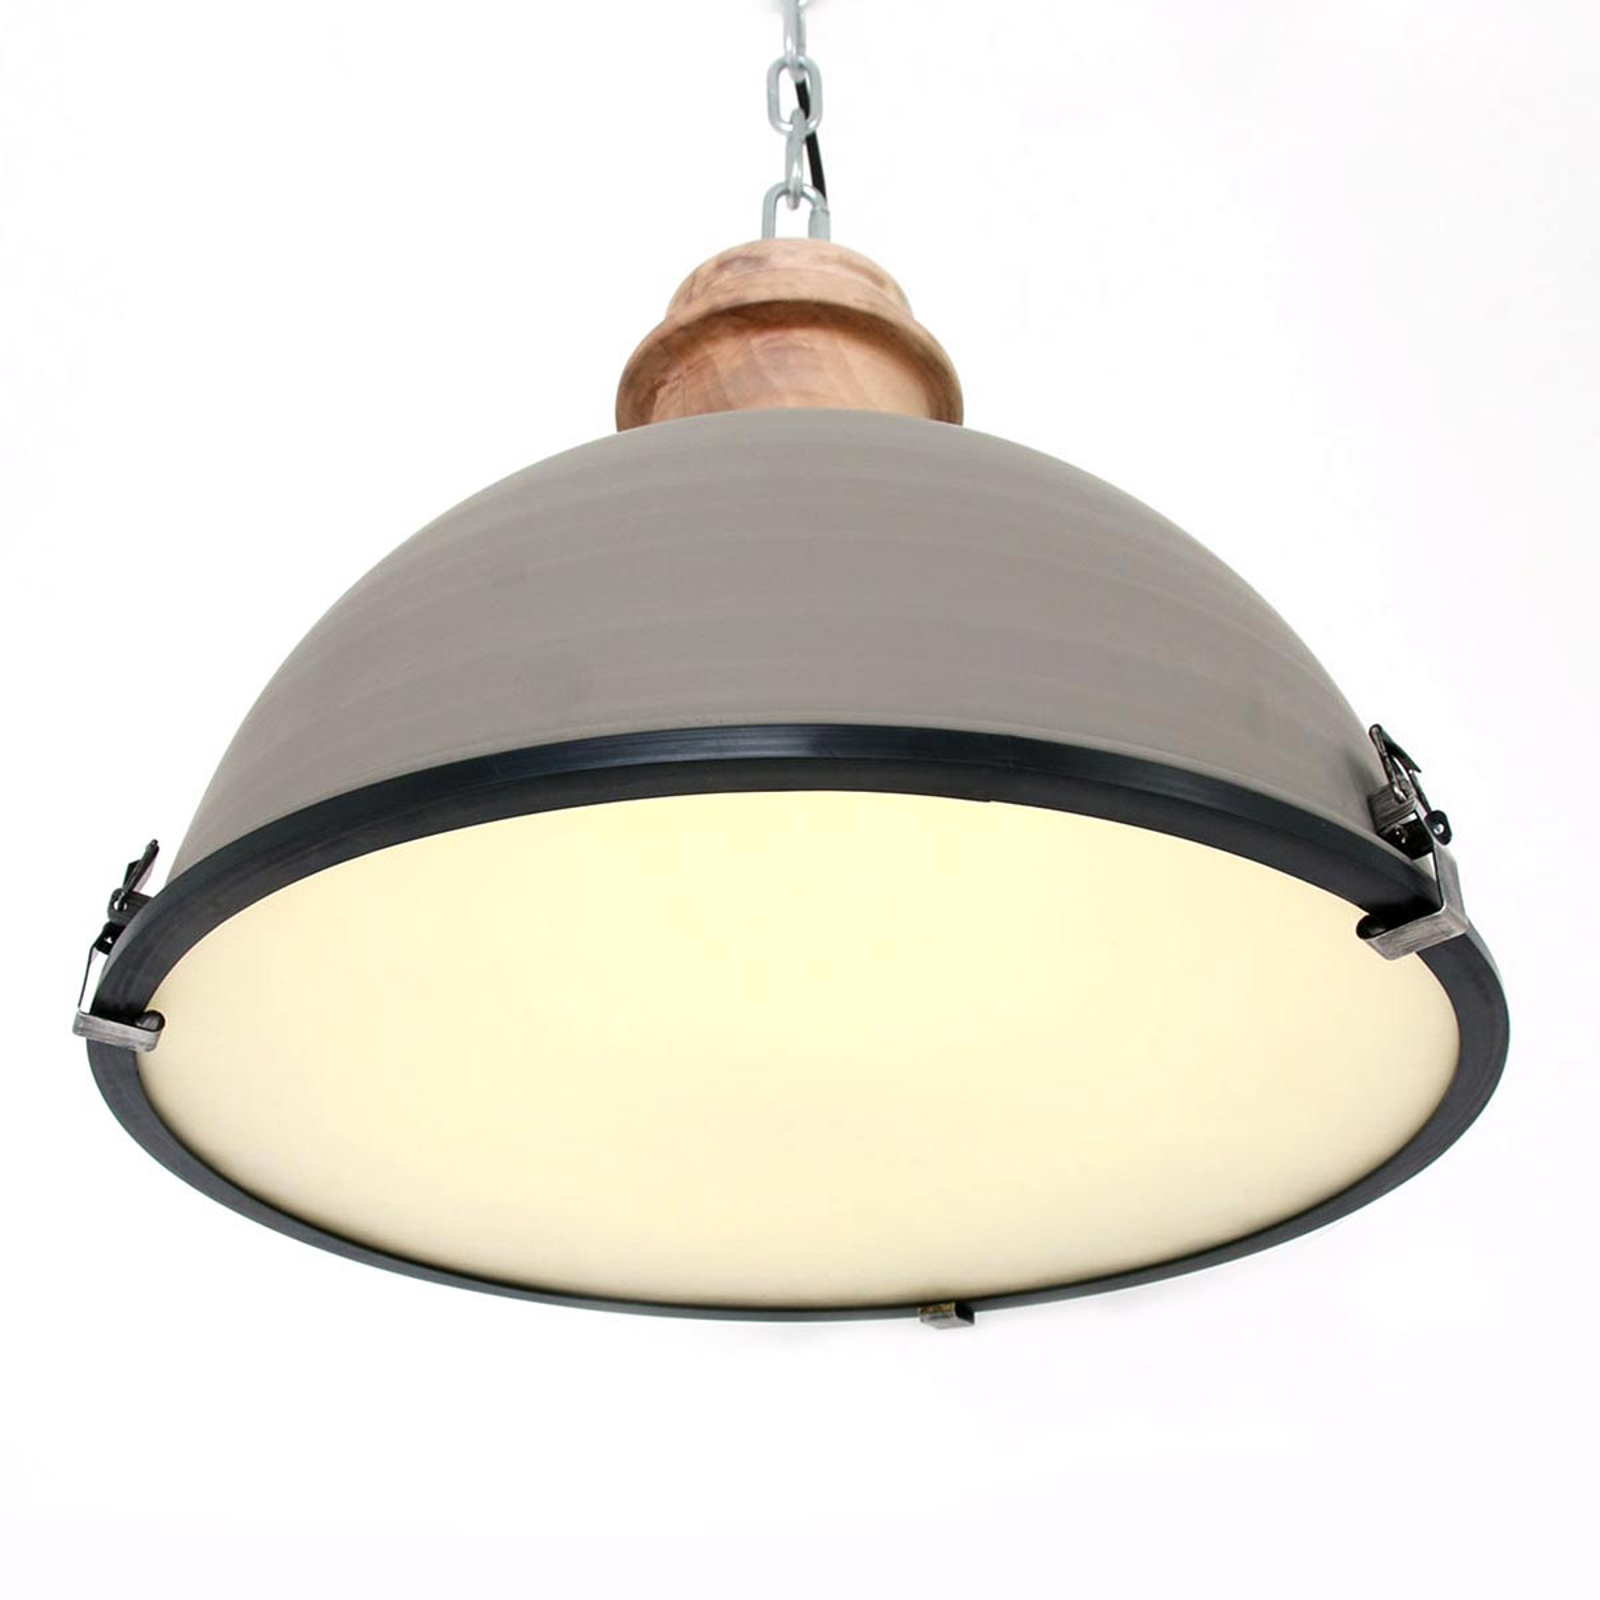 Szara lampa wisząca Bikkel, metalowy klosz